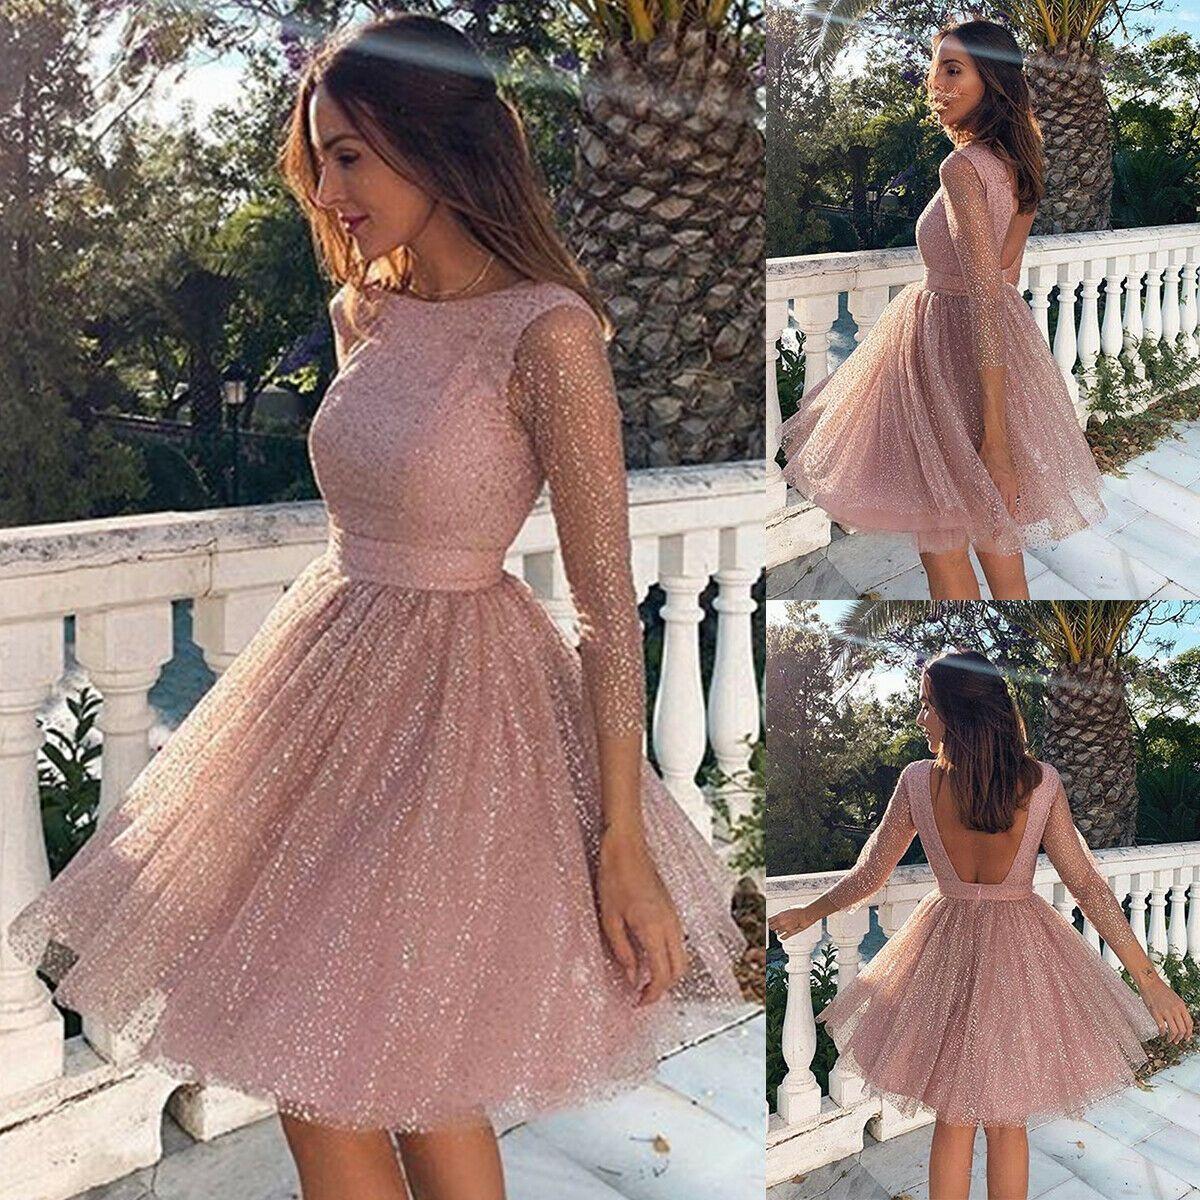 damen hohe taille minikleid pailletten rückenfrei kleid